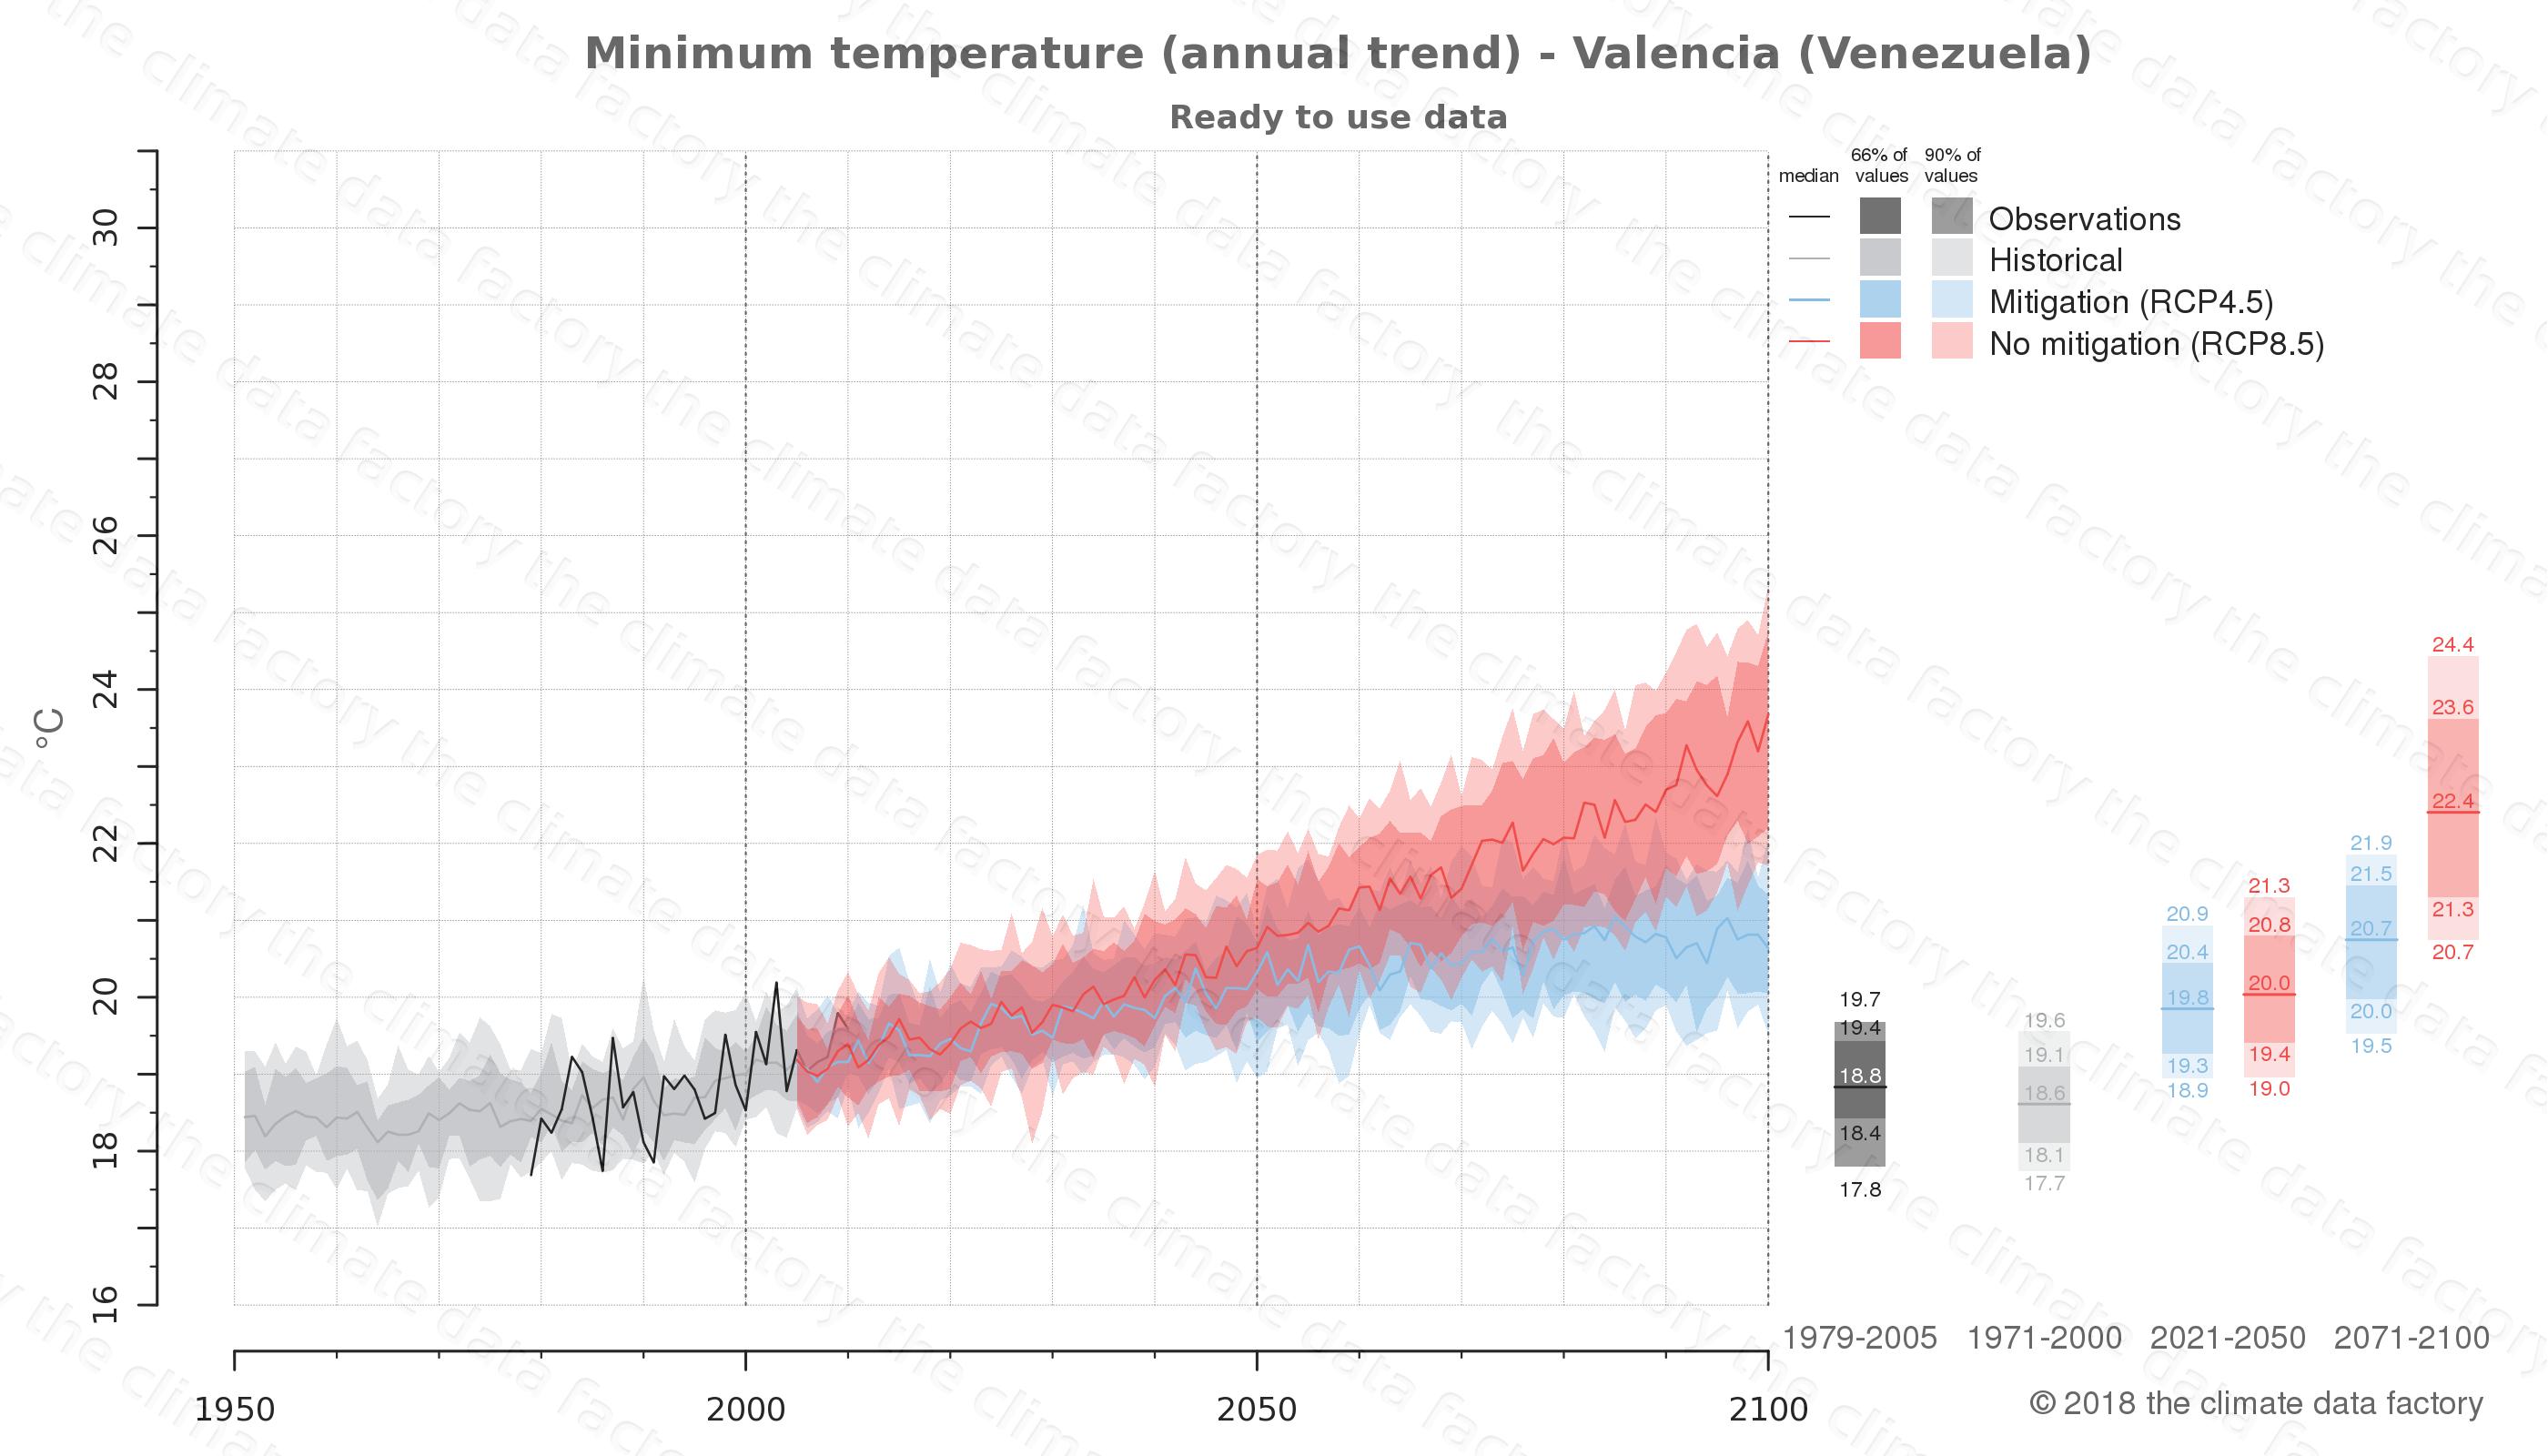 climate change data policy adaptation climate graph city data minimum-temperature valencia venezuela